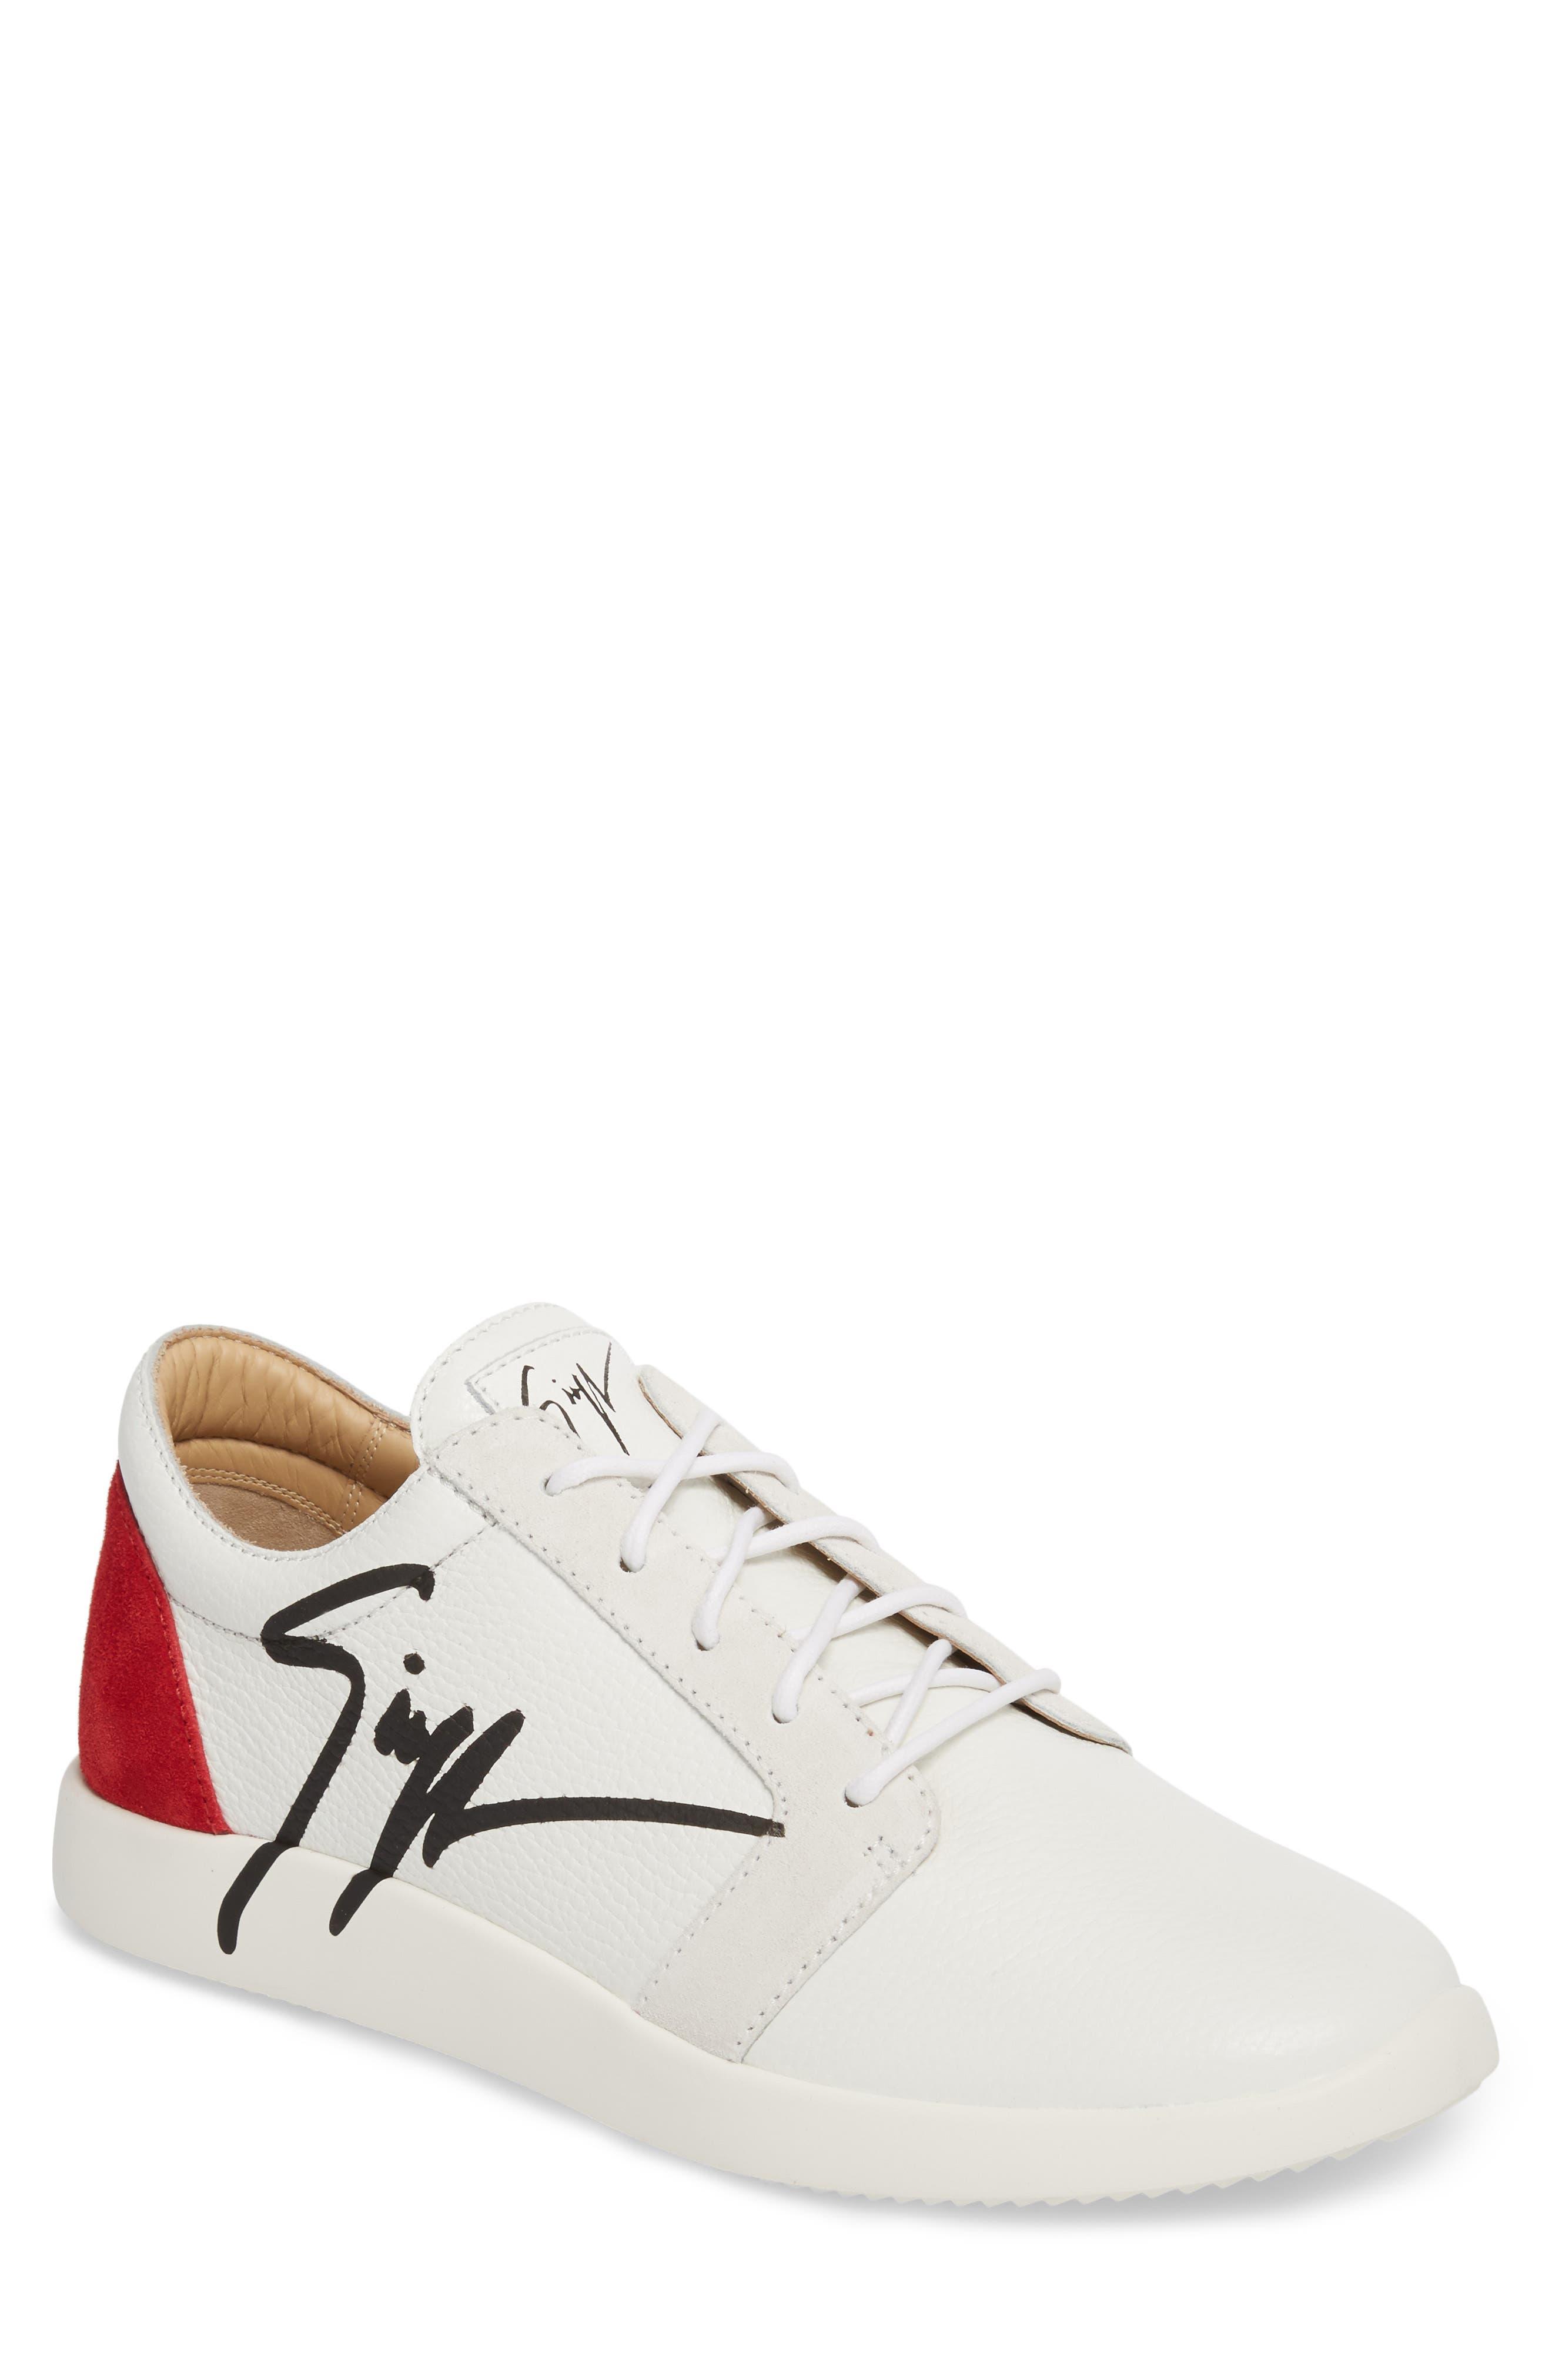 Signature Sneaker,                             Main thumbnail 1, color,                             124